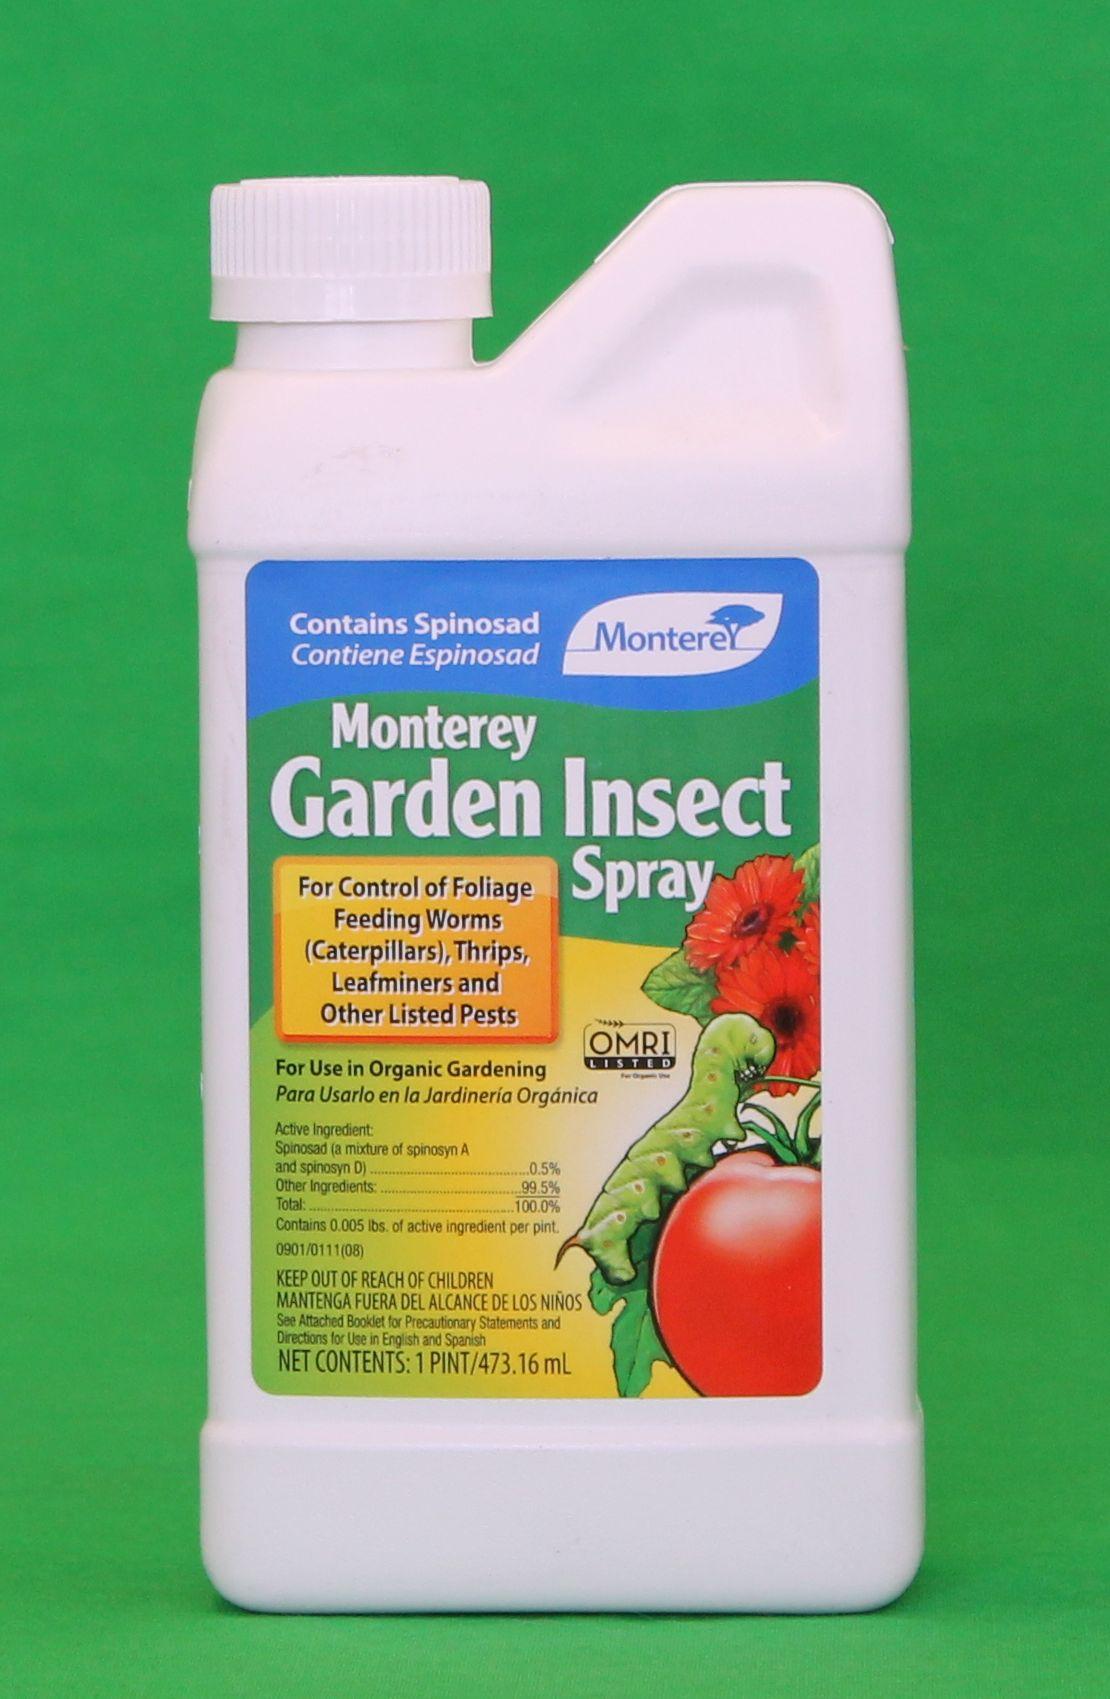 New Monterey Garden Insect Spray Spinosad 1 Pint